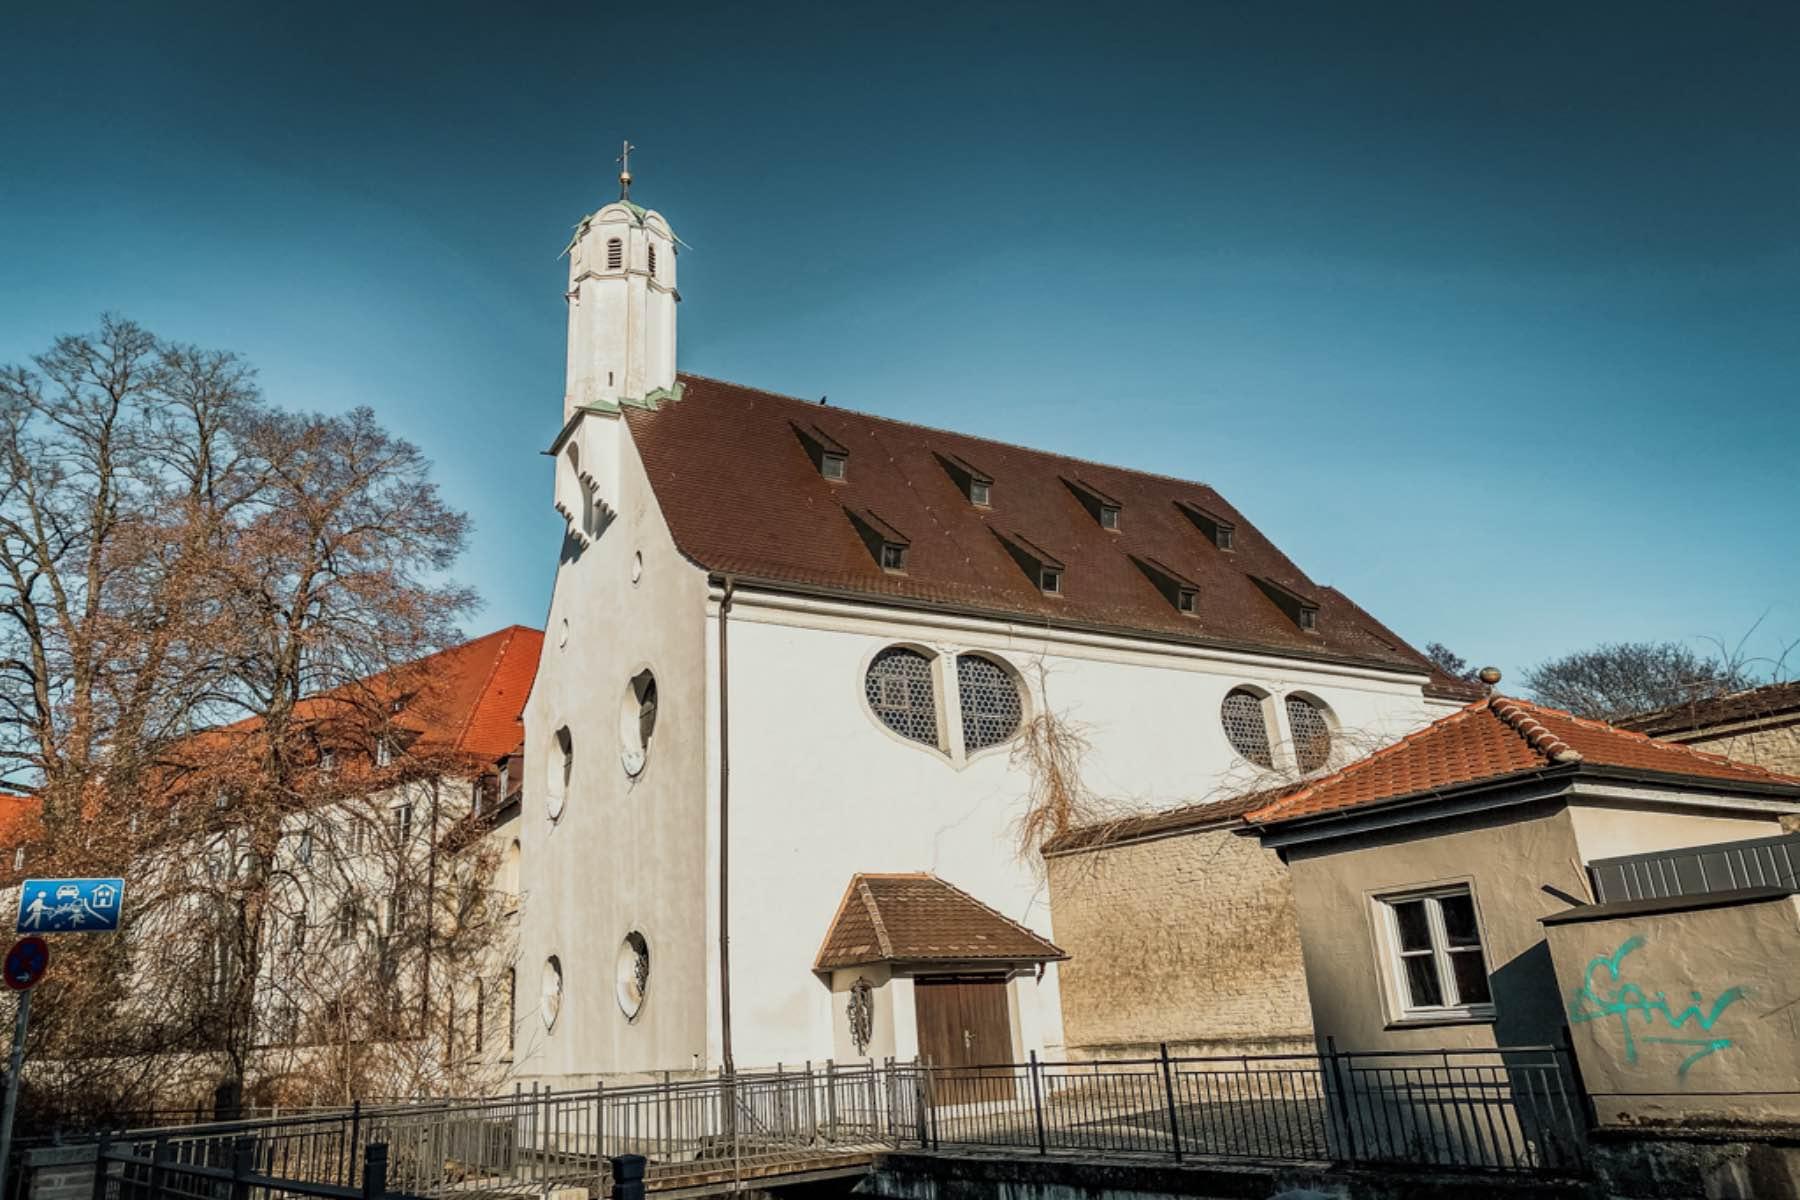 geheimtipp Augsburg vorderer lech